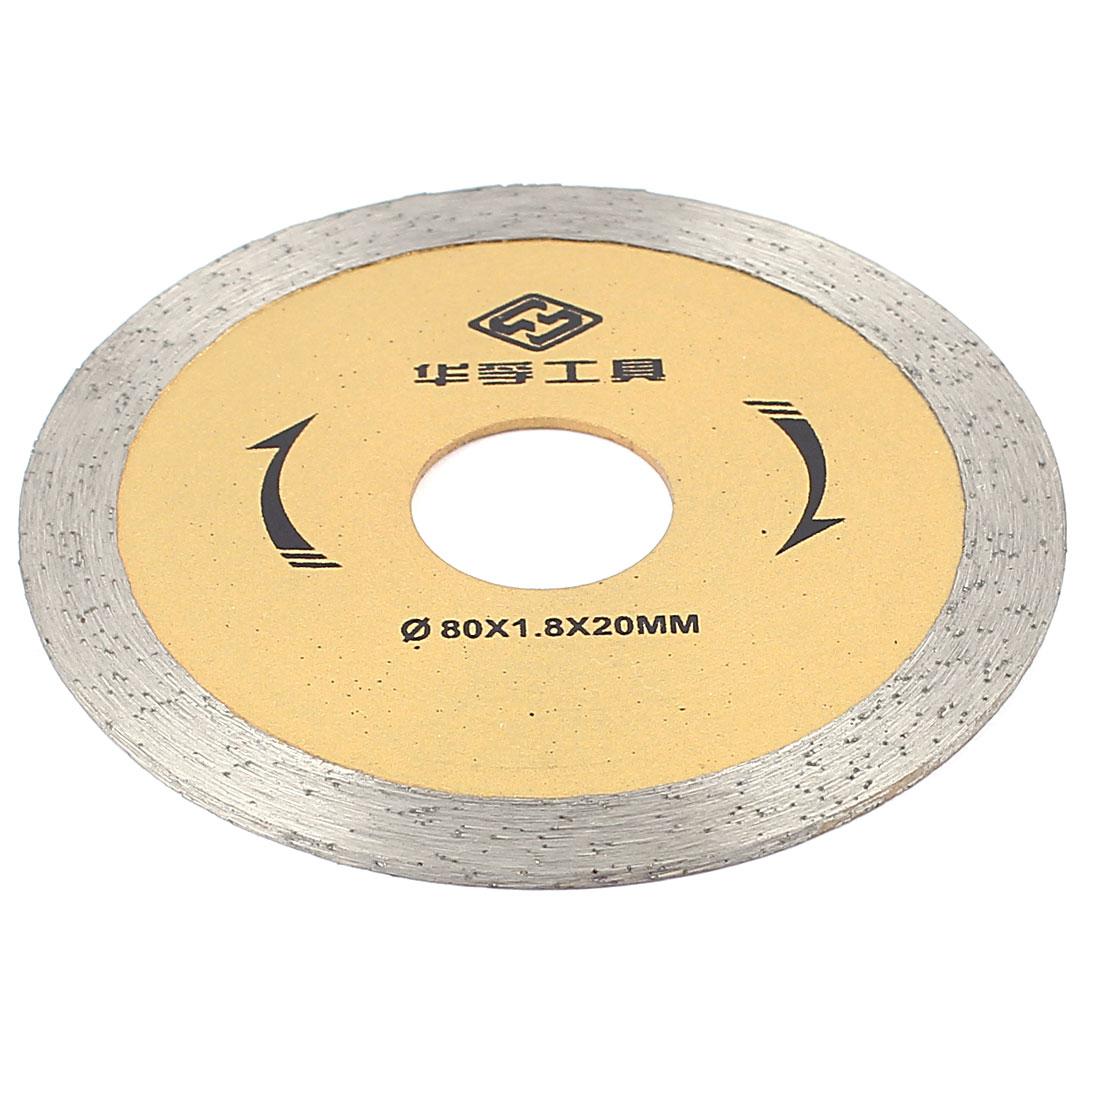 Diamond Stone Circular Tipped Saw Cutter Tile Cut Tool 80mmx1.8mmx20mm